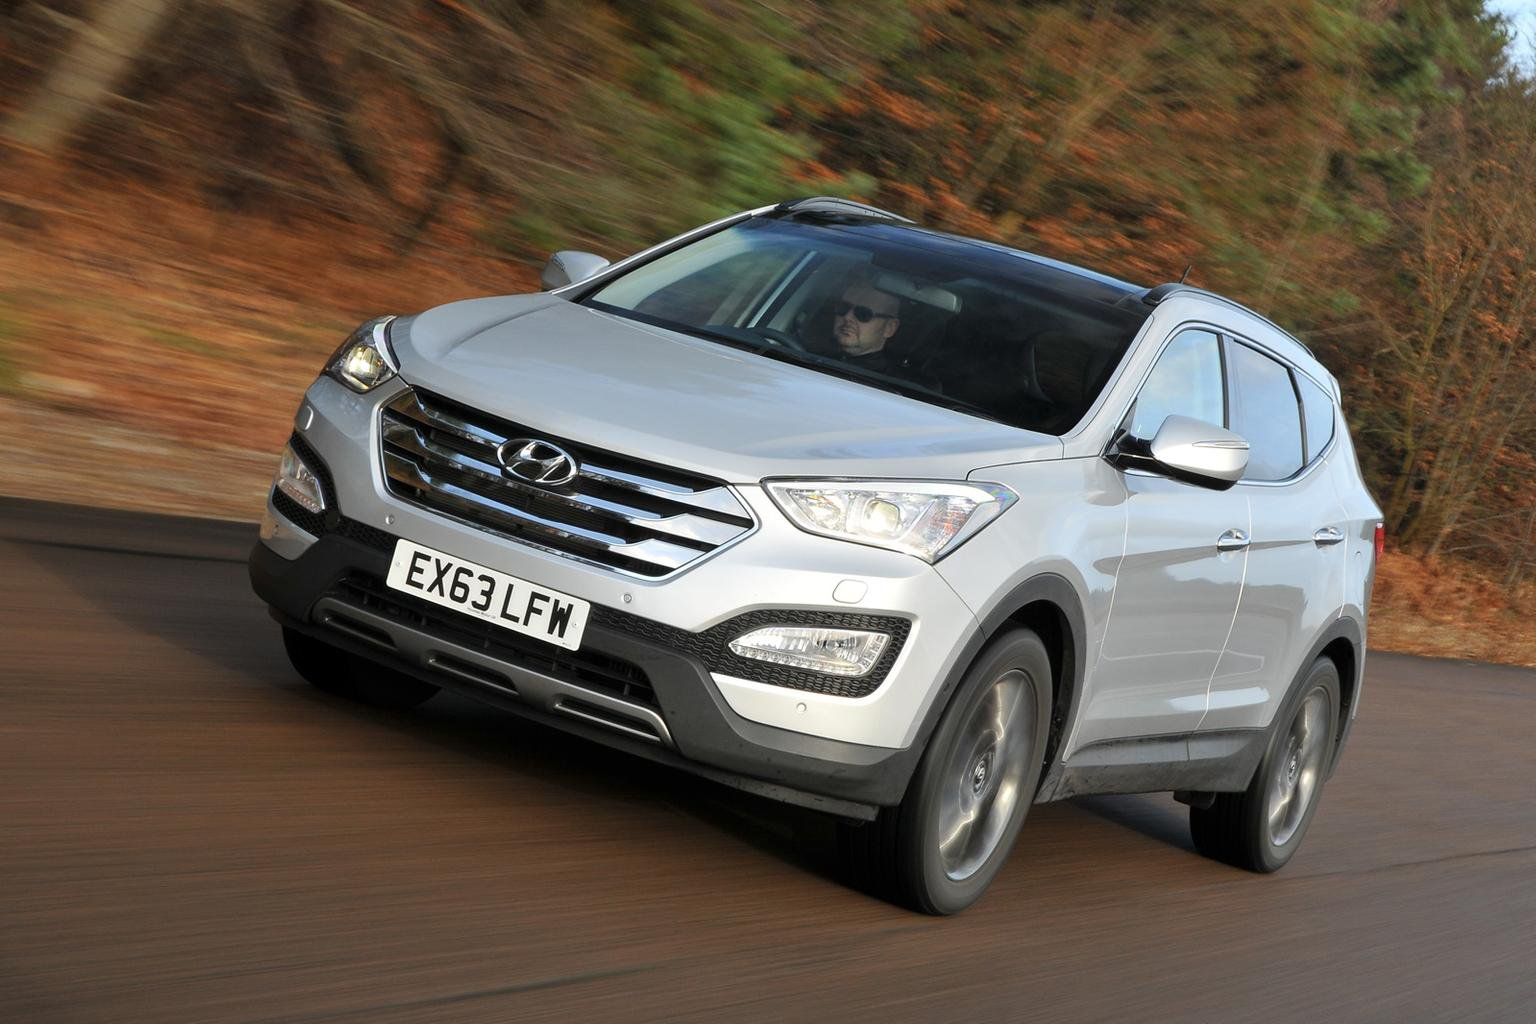 Our cars: Hyundai Santa Fe and Skoda Octavia